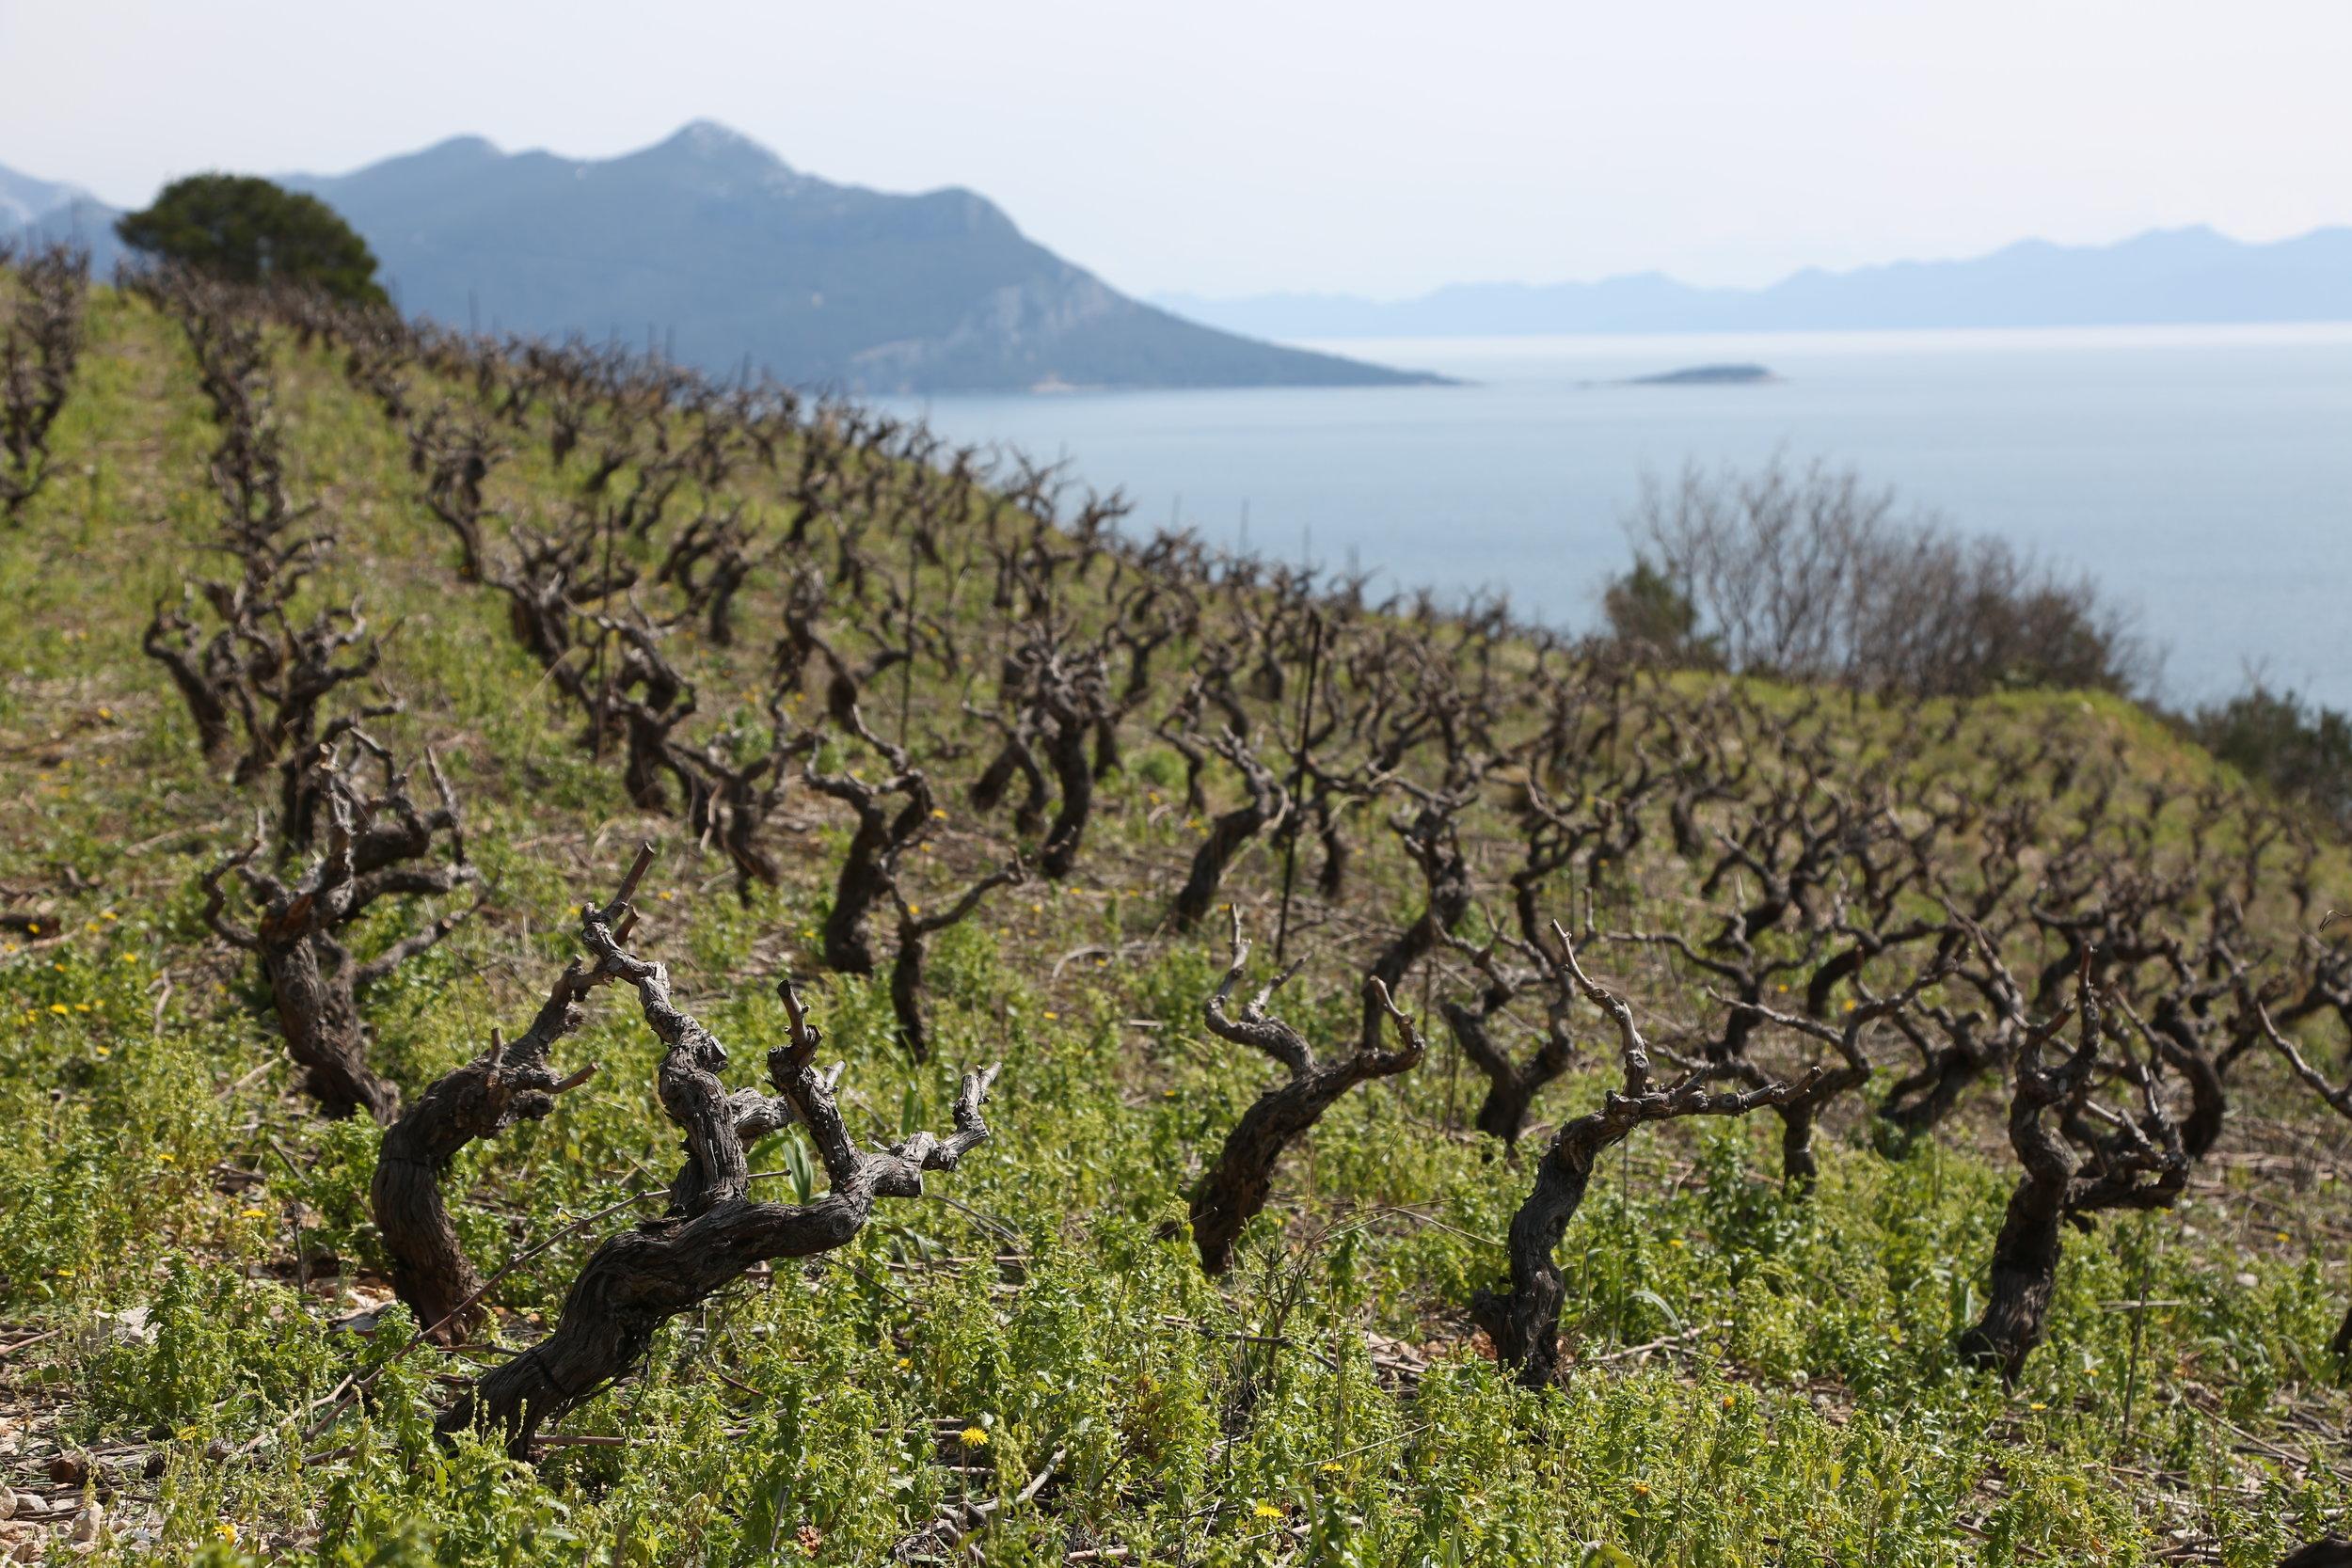 Rows of vines with a view_Dingac, Peljesac Peninsula.JPG